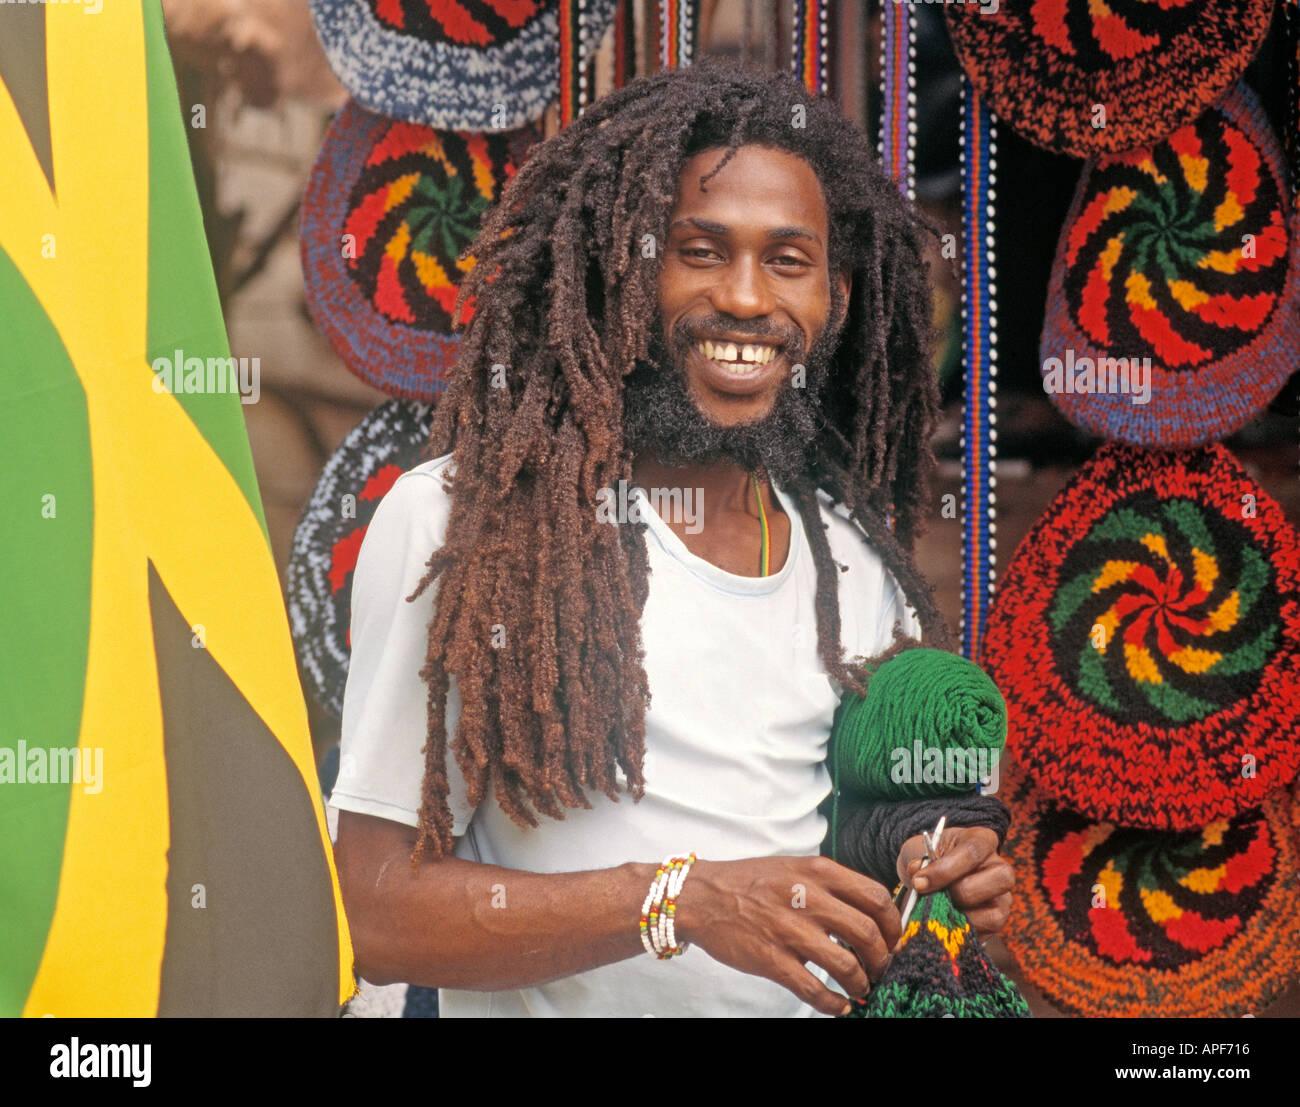 dating a rastafarian man Rastafari: rastafari, religious and political movement based on their reading of the old testament, many rasta men uphold patriarchal values.